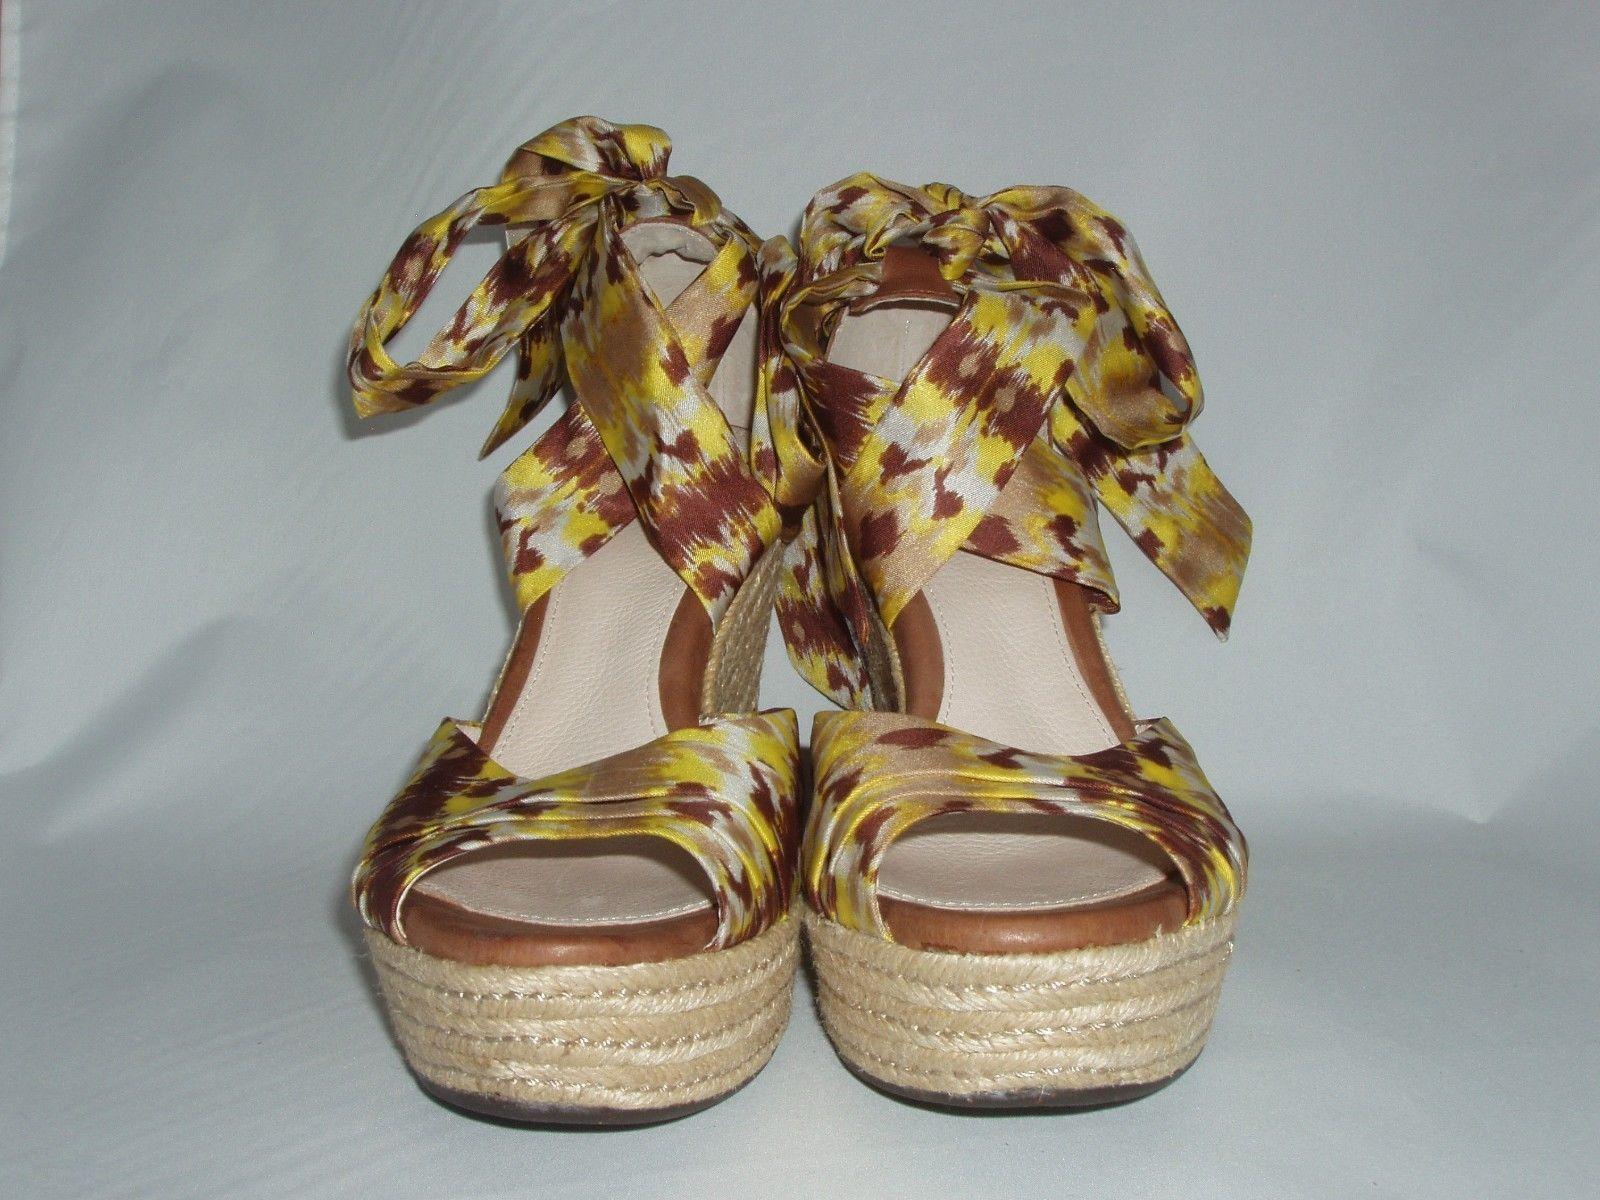 Ugg Australia Lucianna Lemon Strappy Platform Wedge Sandals Size 8.5B